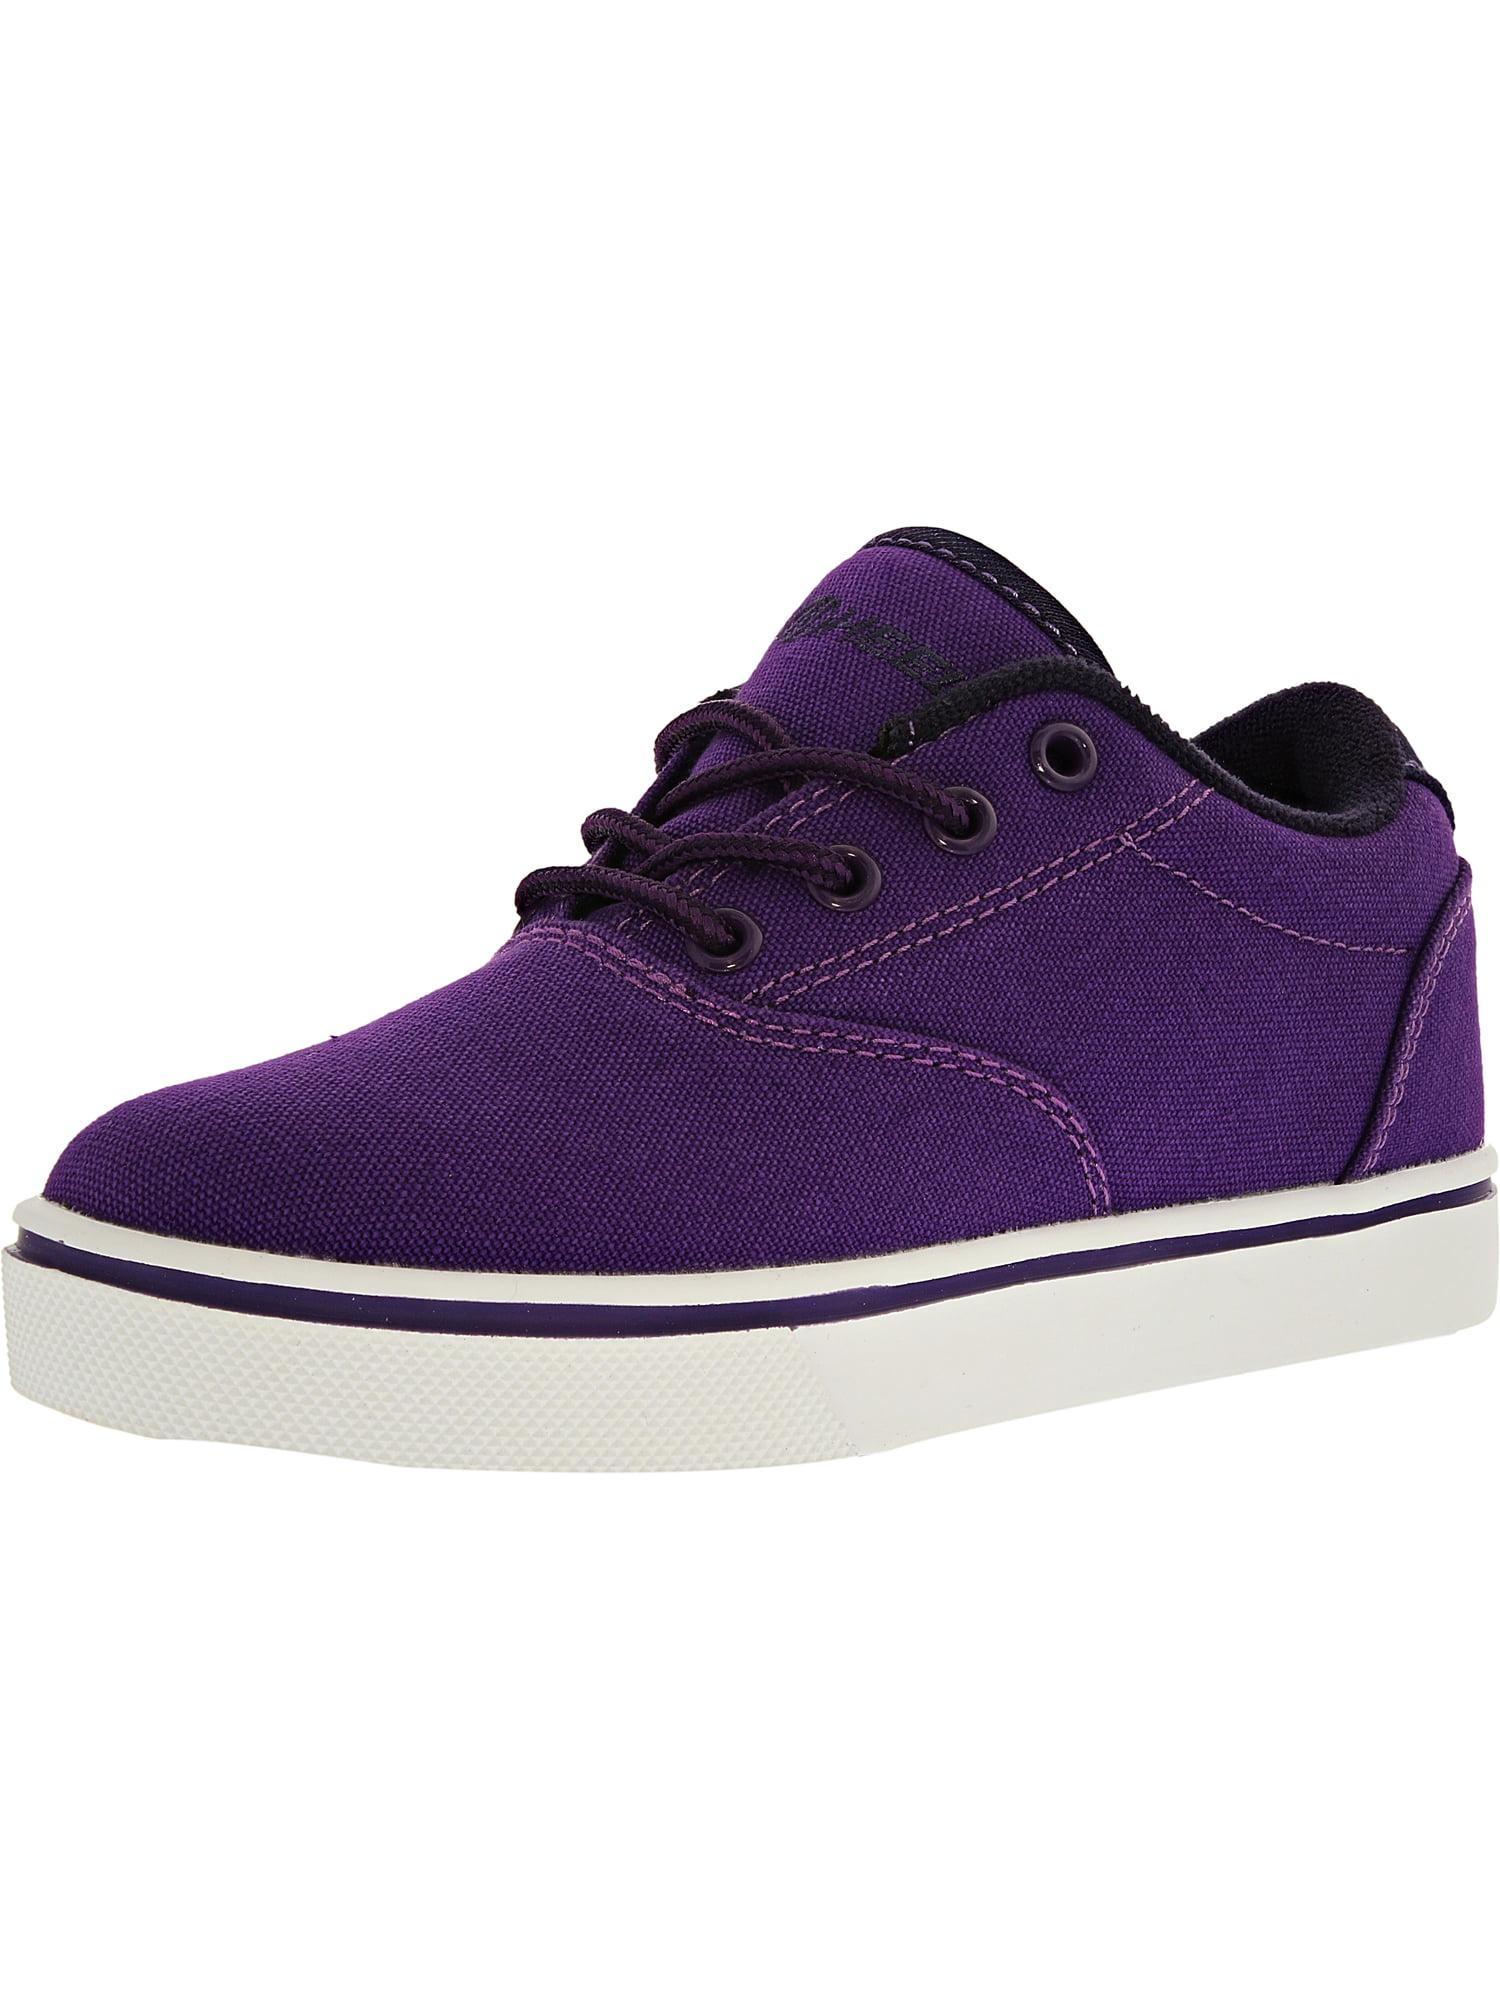 Heelys Launch Purple/Grape/White Ankle-High Fashion Sneaker - 2M